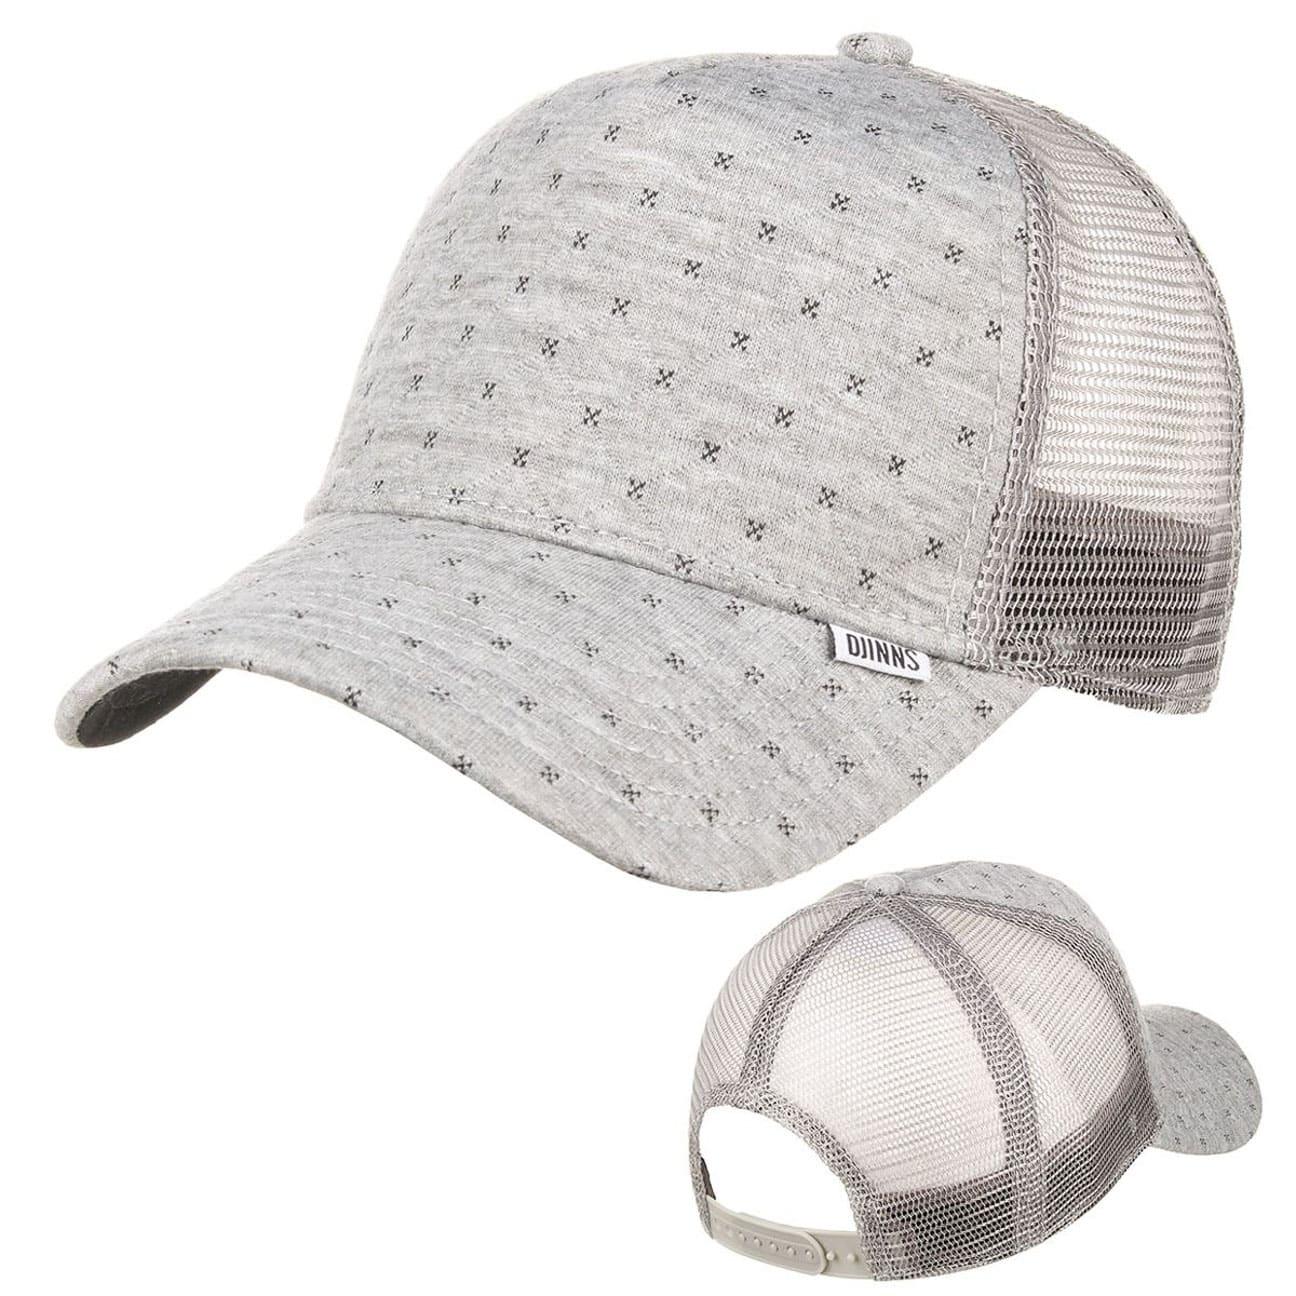 hft padded jersey trucker cap by djinns eur 21 99. Black Bedroom Furniture Sets. Home Design Ideas